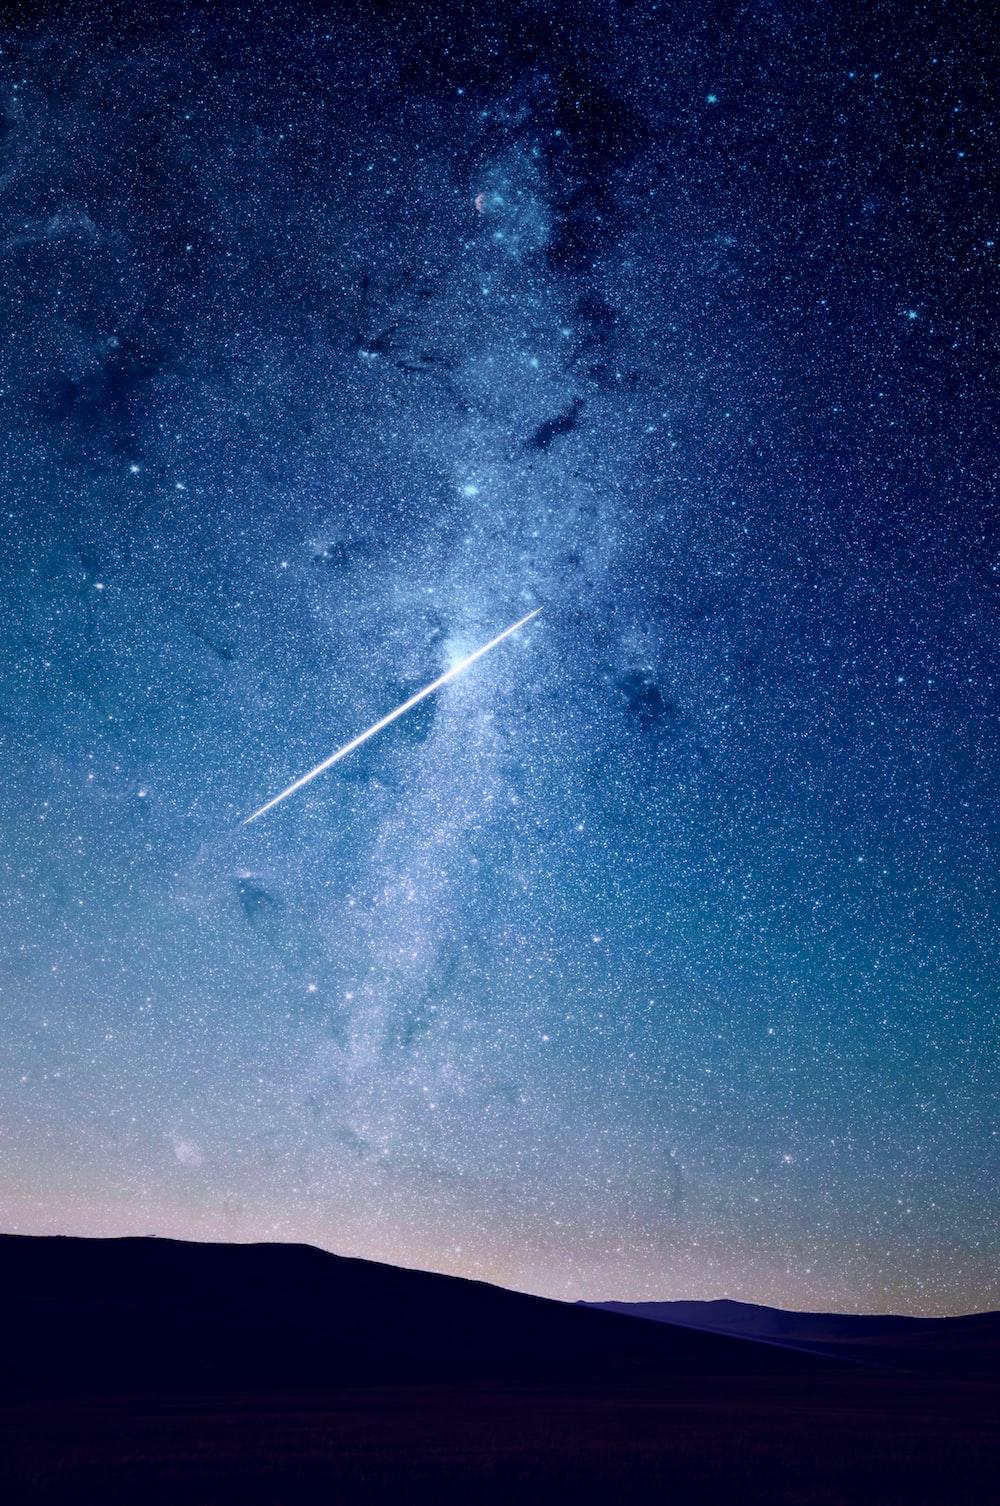 shooting star under blue sky